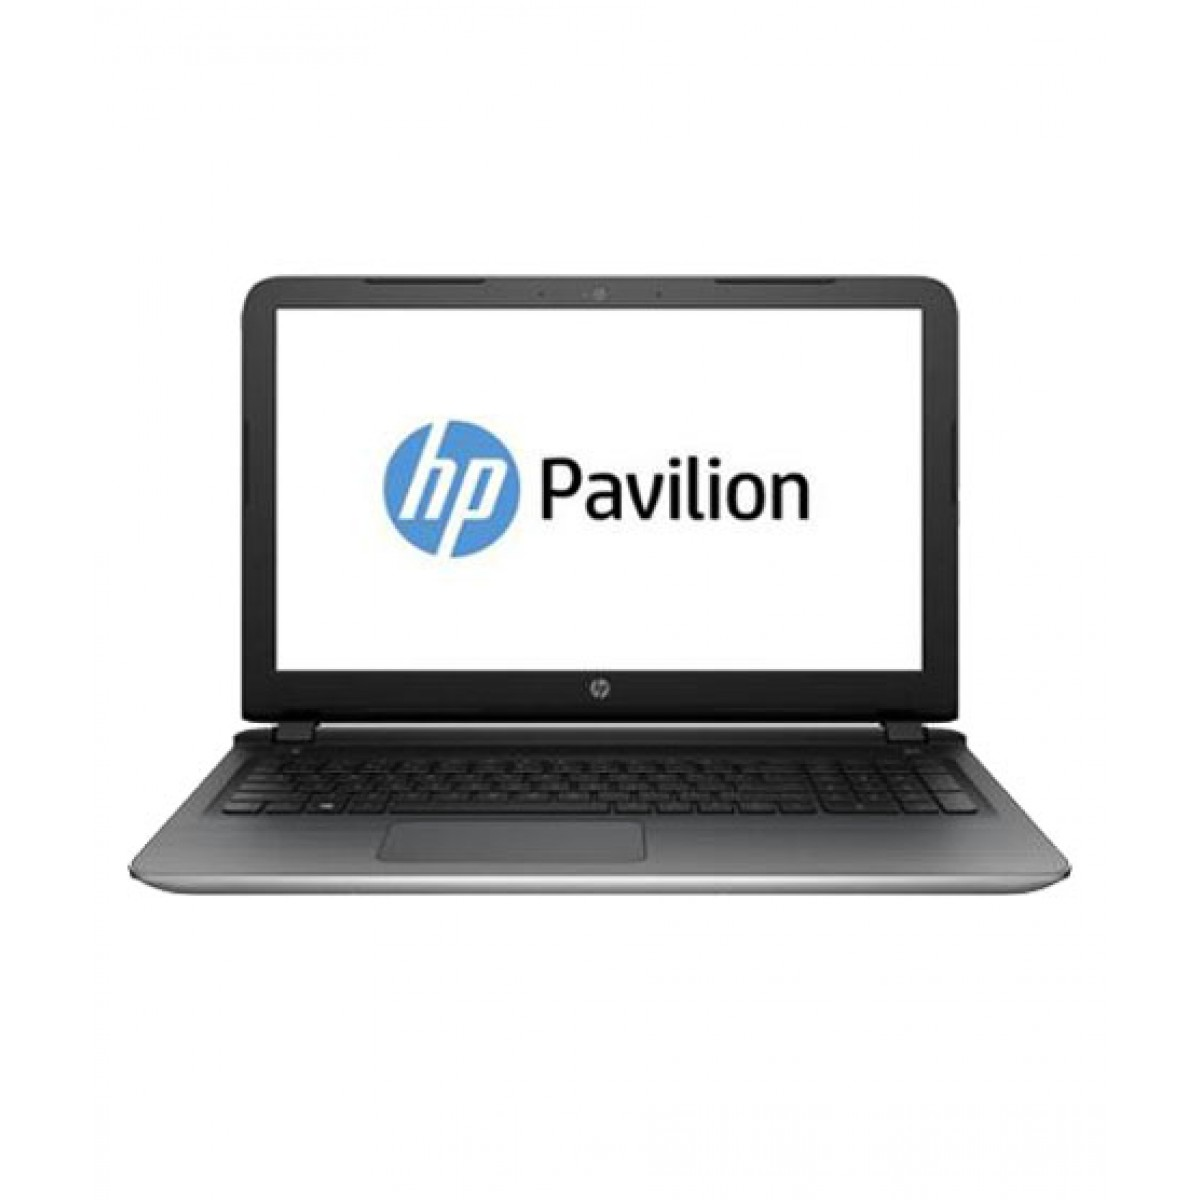 "HP Pavilion Laptop 15.6"" Core-i5 6200U (15T-AB200)"